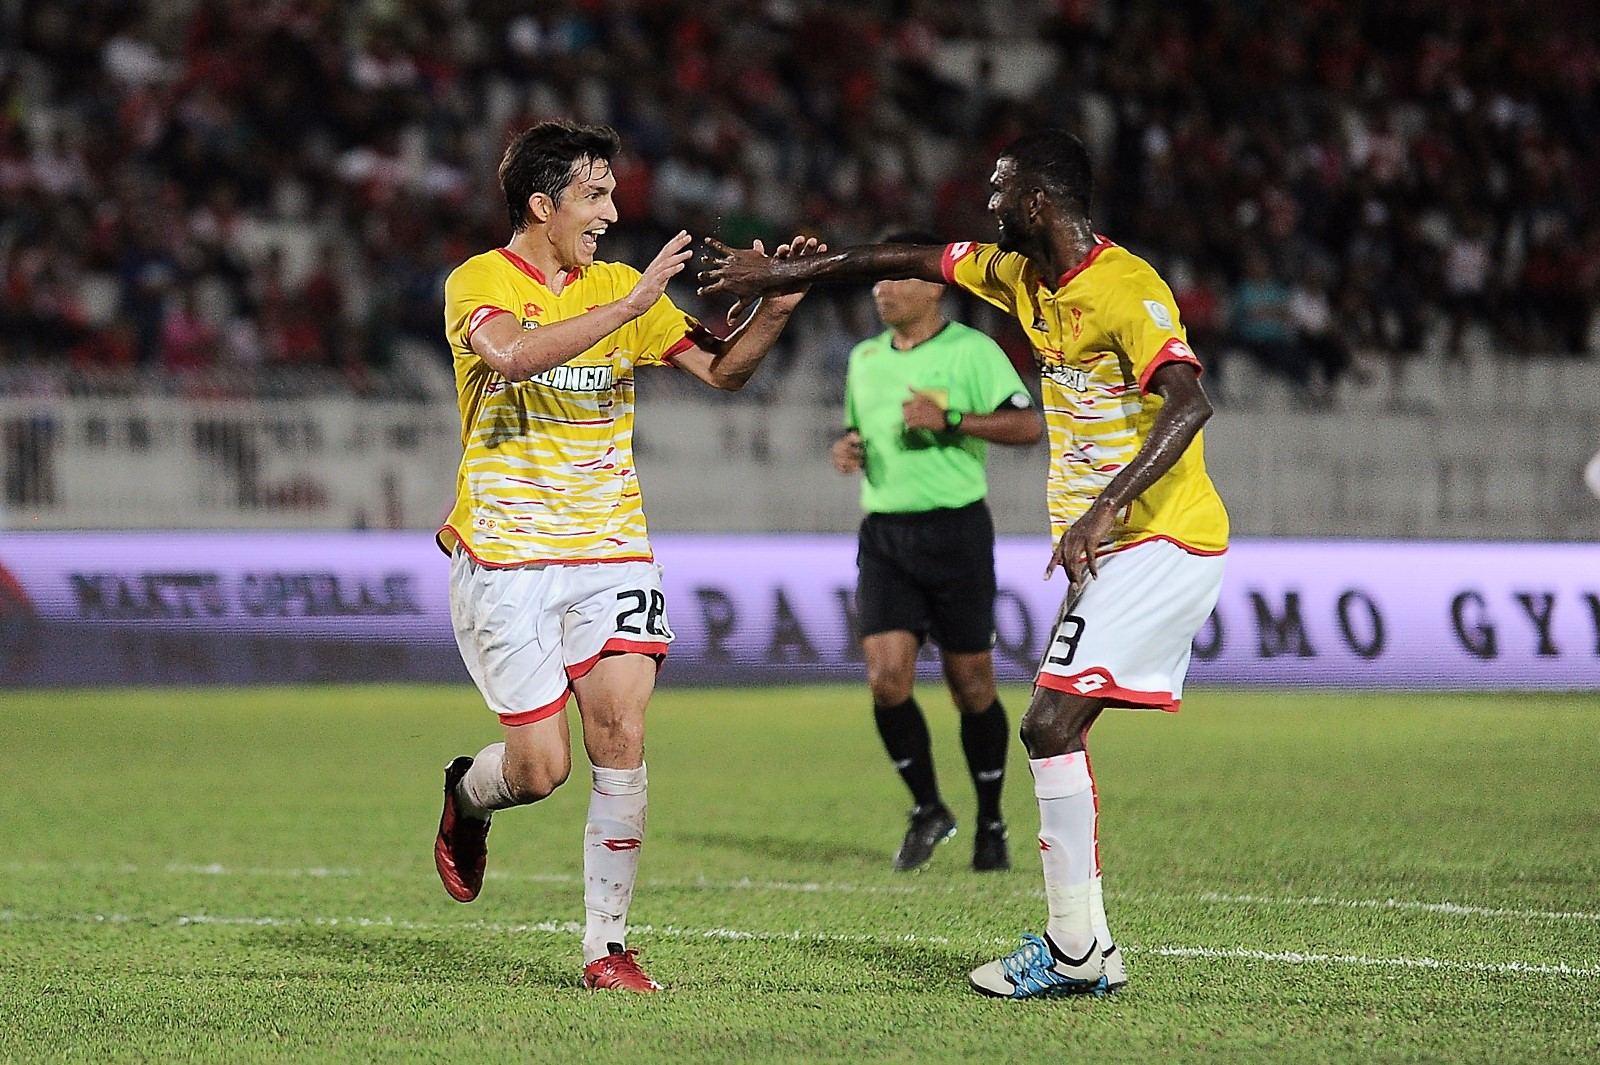 Selangor's Juliano Mineiro (left) celebrates his goal against Kelantan with S. Veenod 25/2/2017